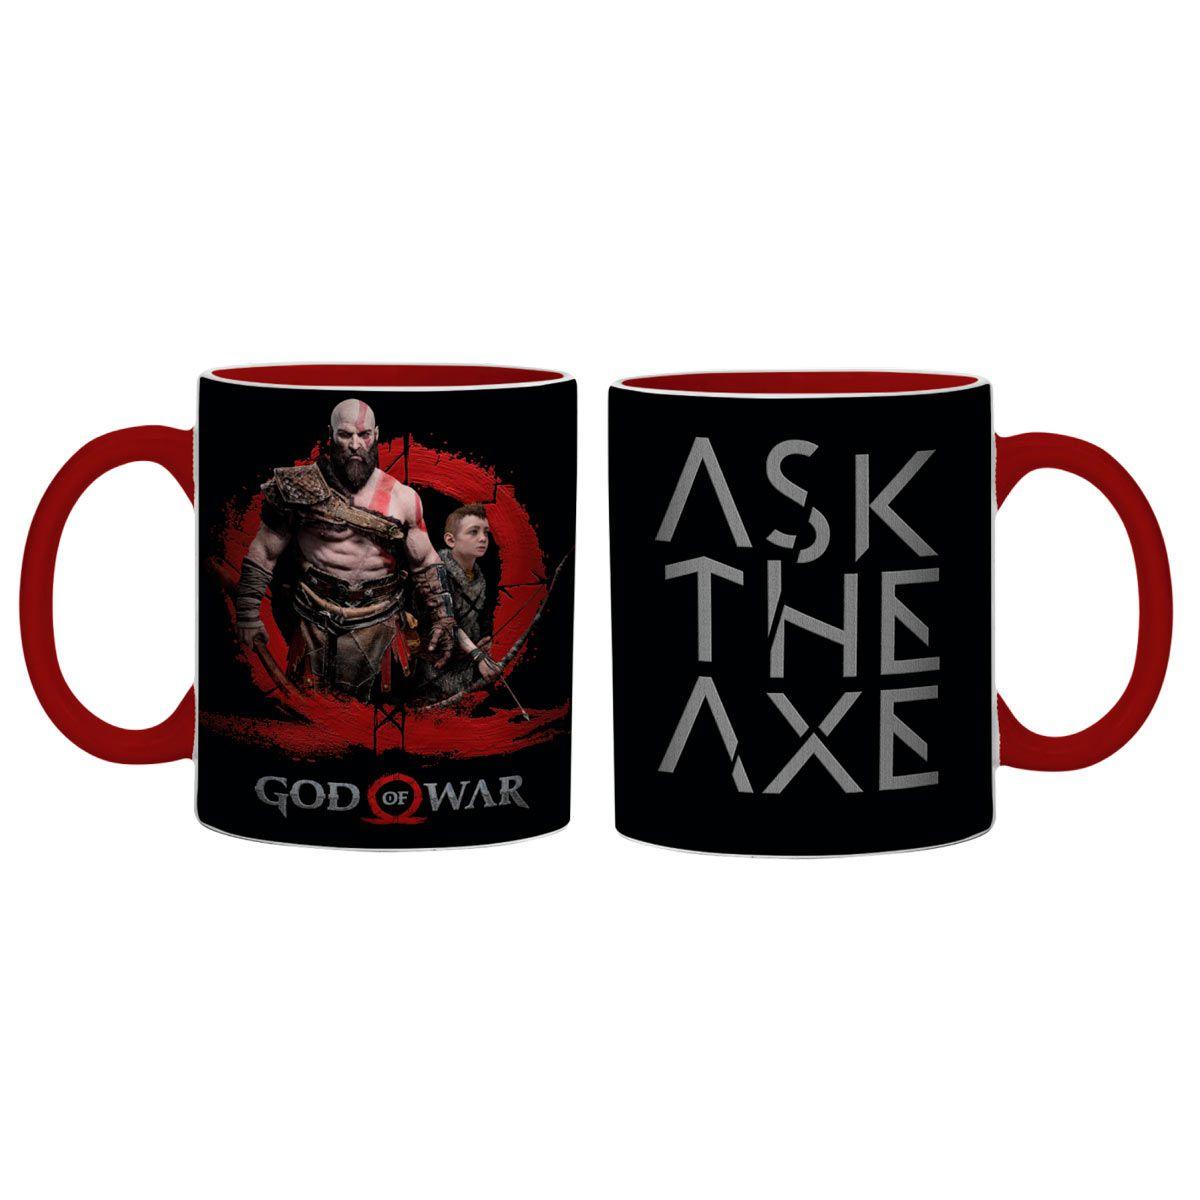 Caneca Porcelana Kratos axe God of Wars